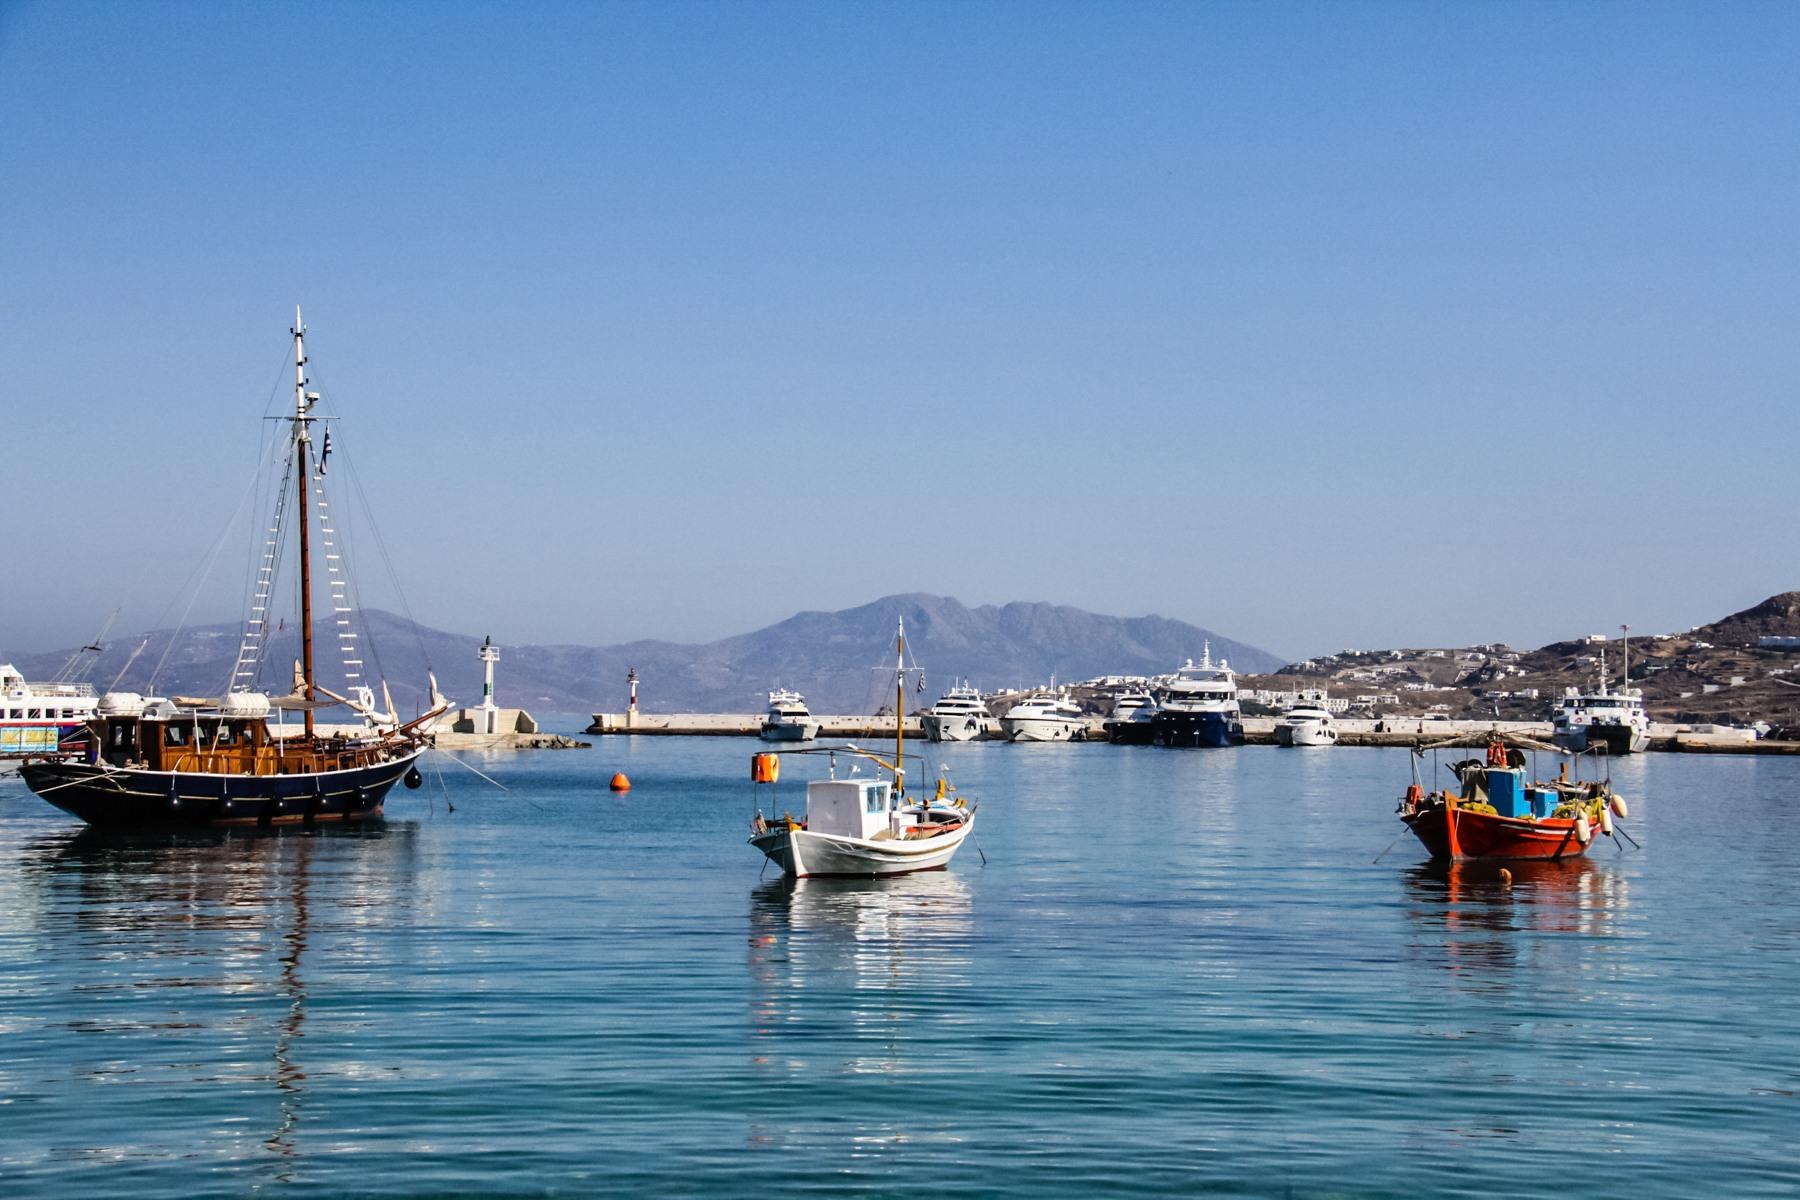 20 Photos to Inspire You to Travel to Mykonos